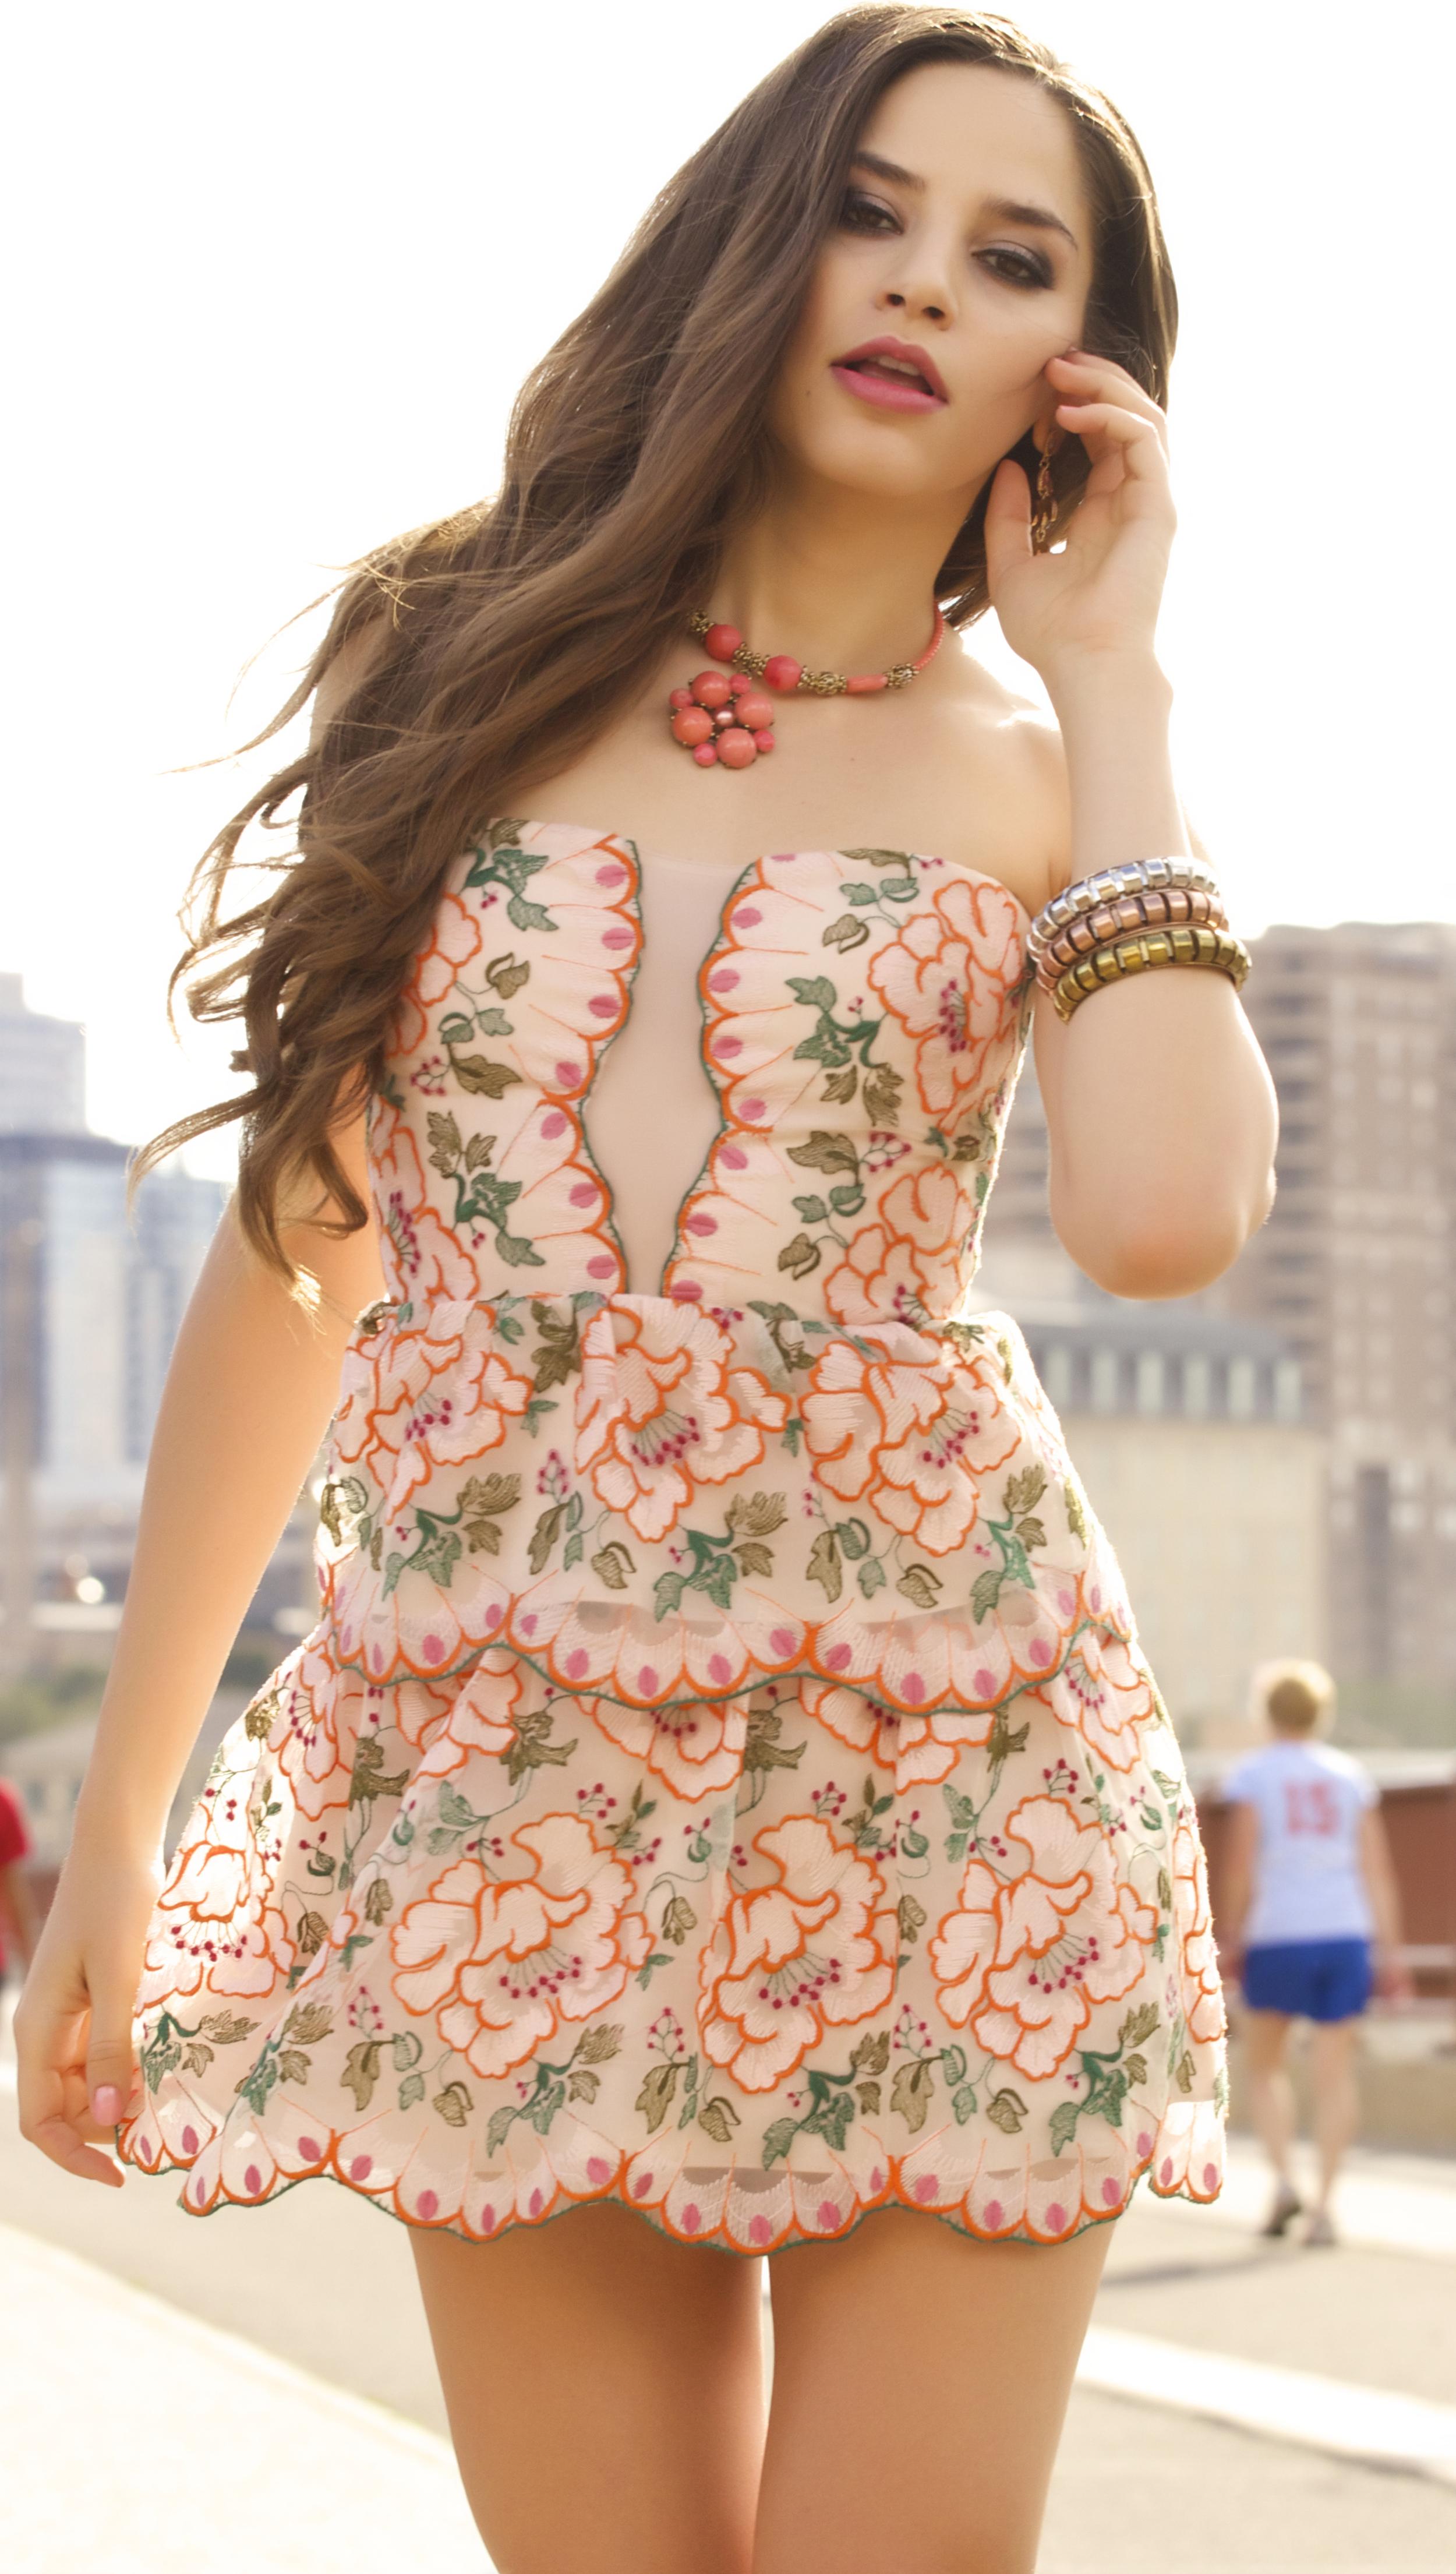 Model Taylor Skye